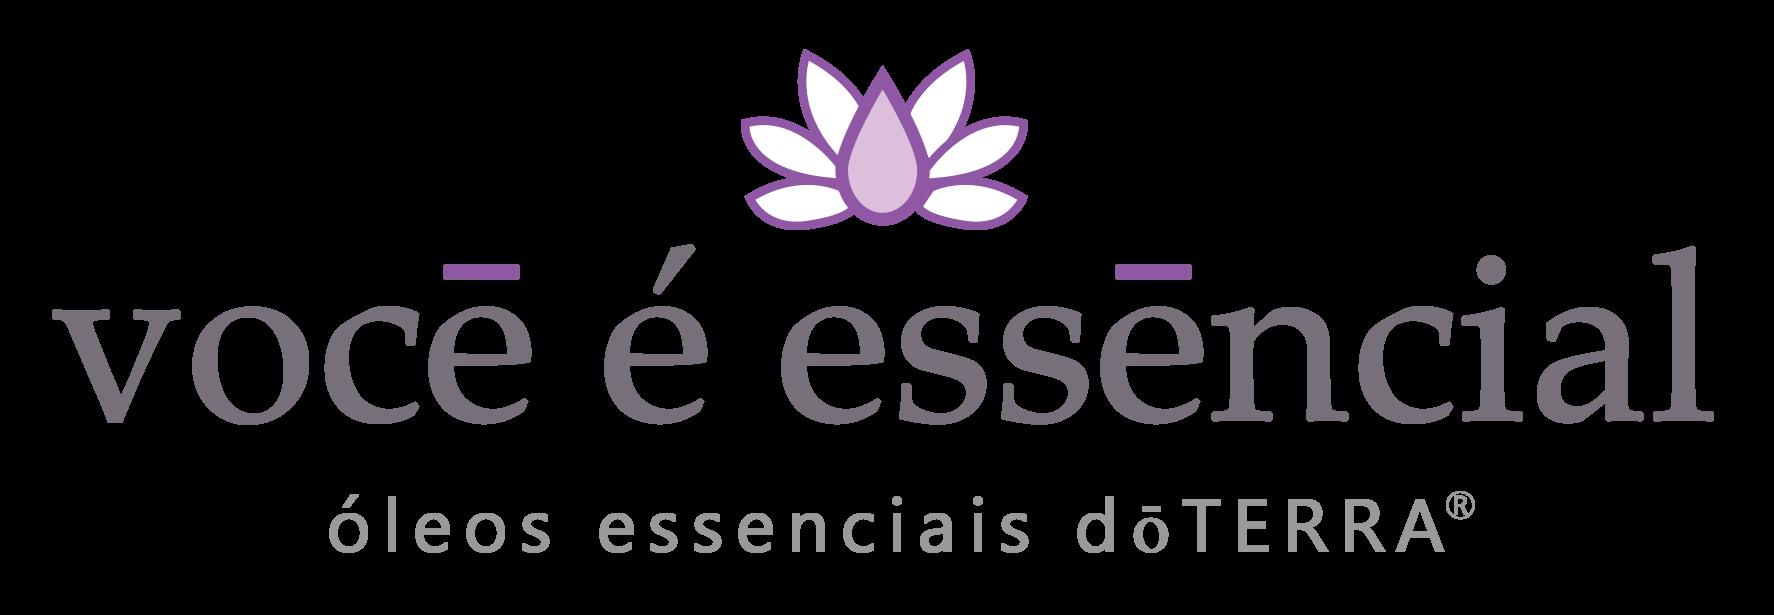 Voce essencial – DōTERRA